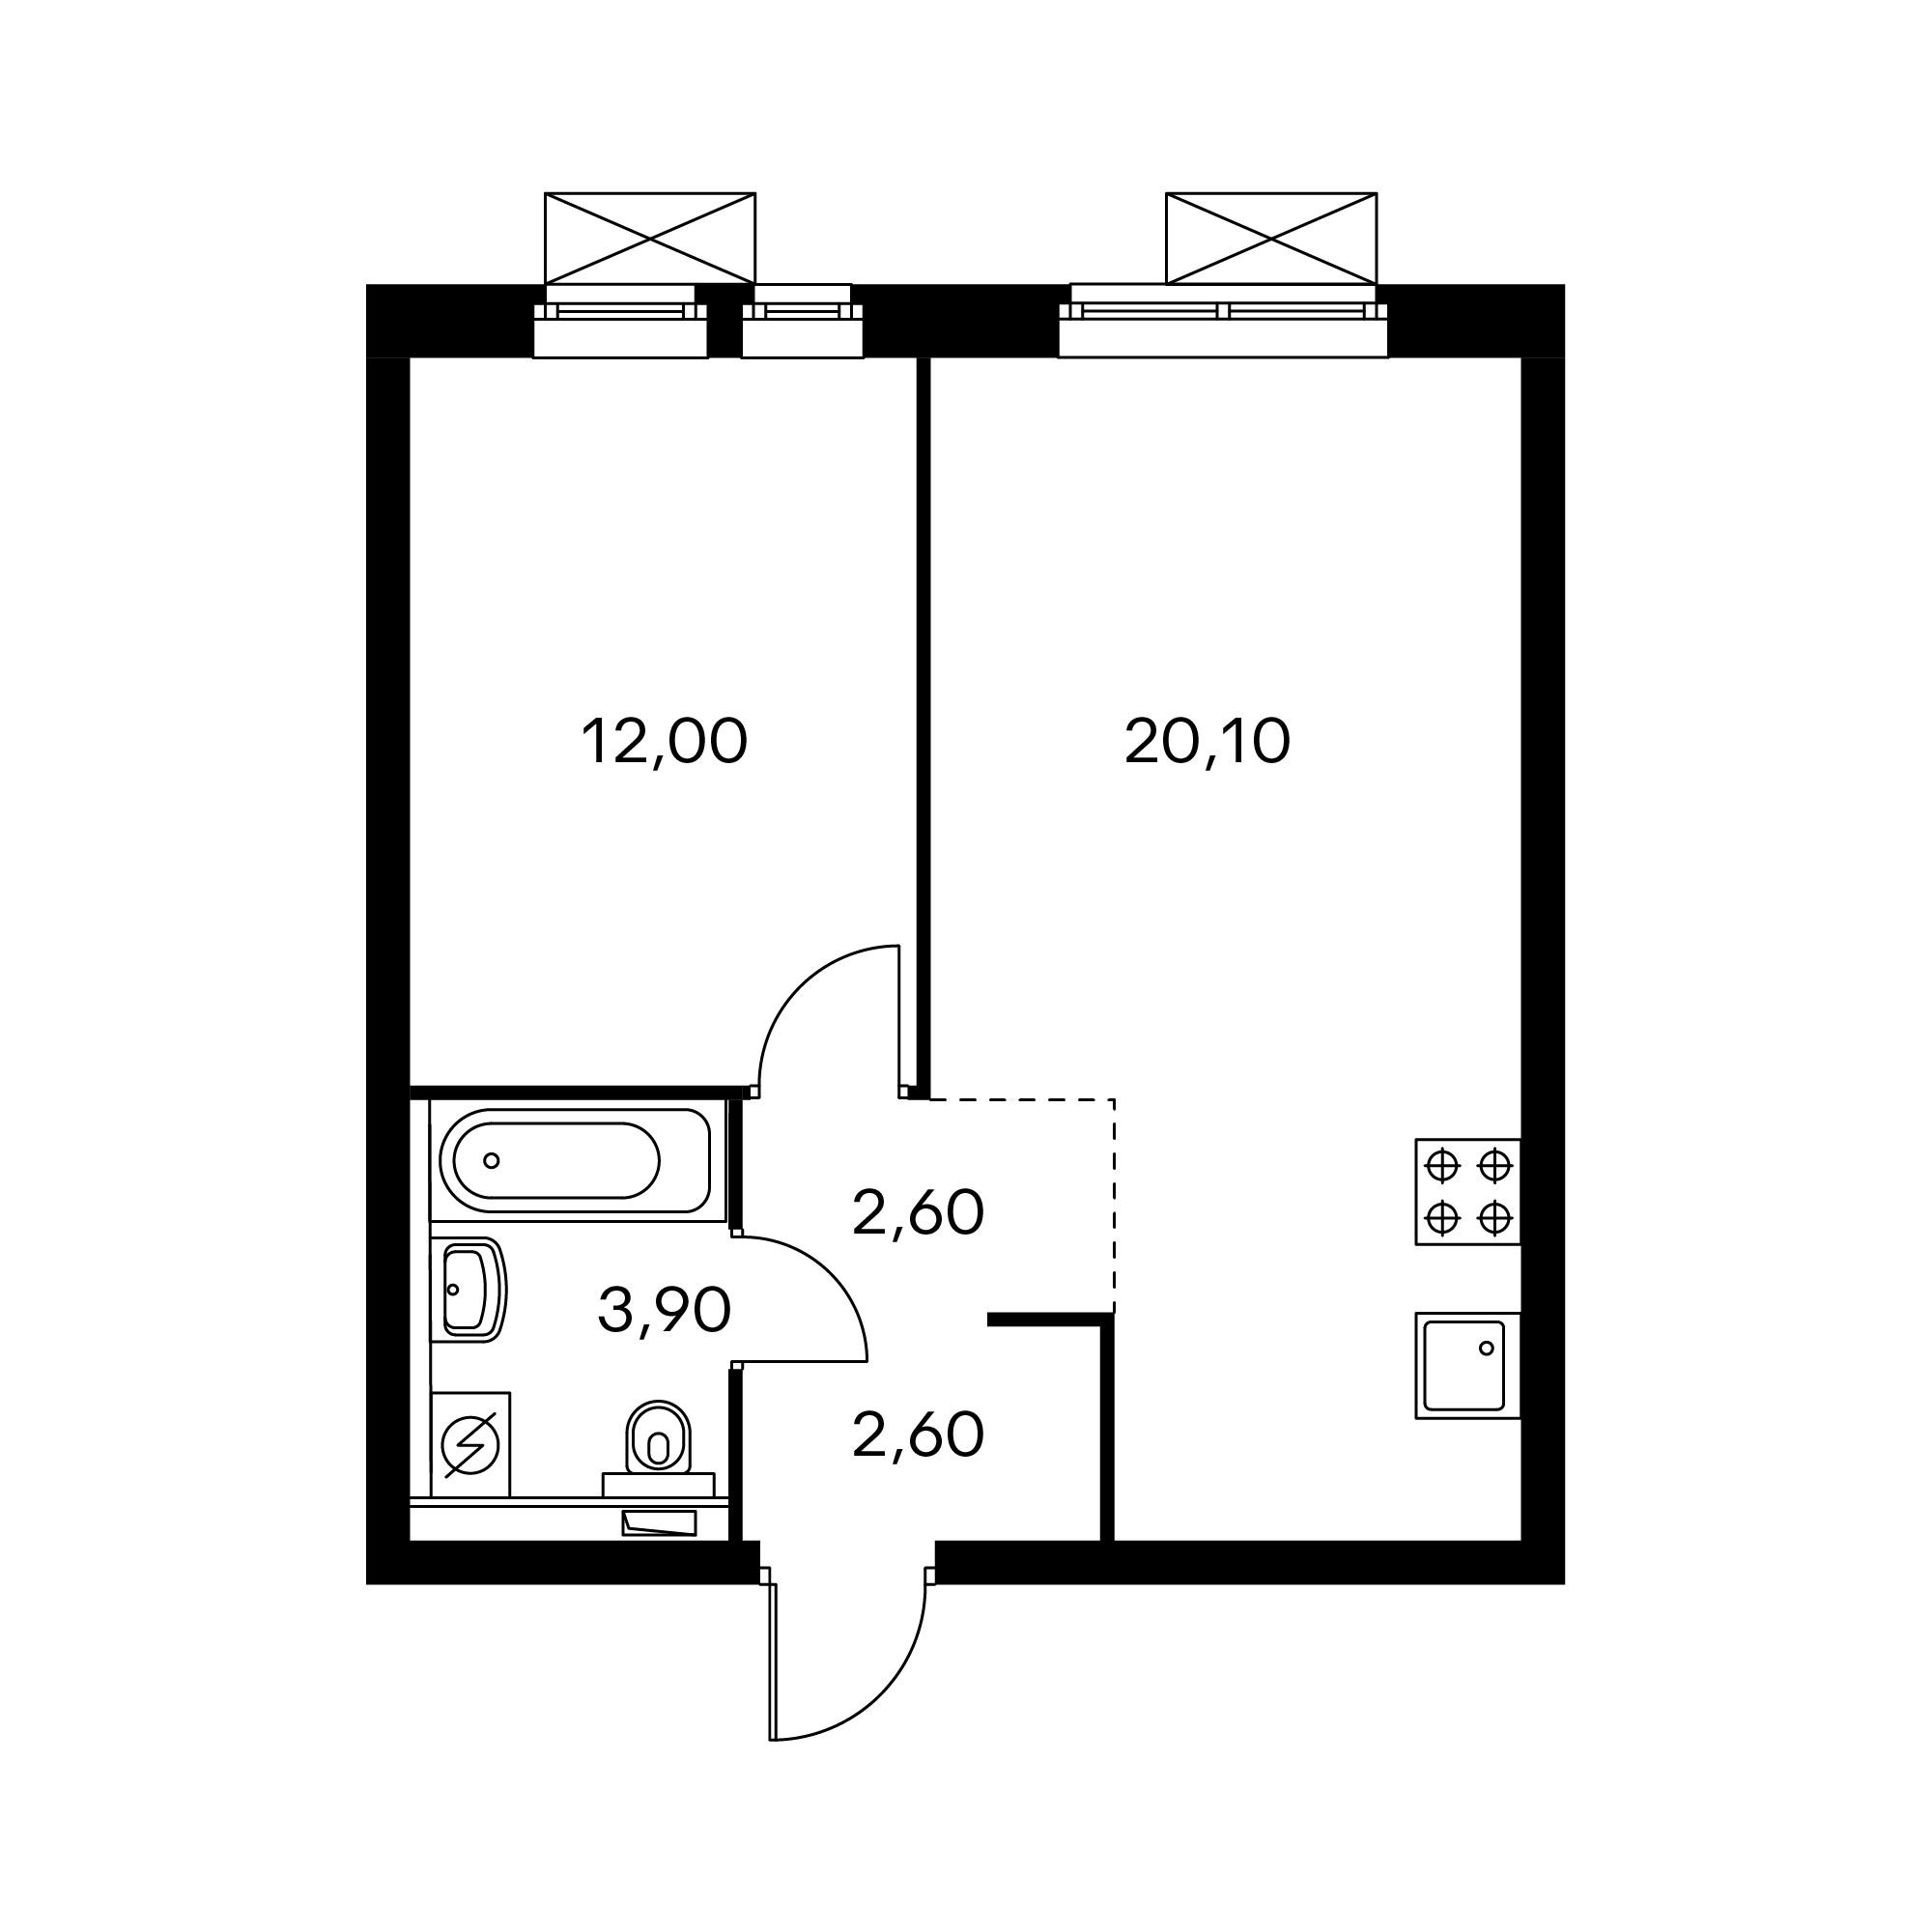 1EM1_6.6-1